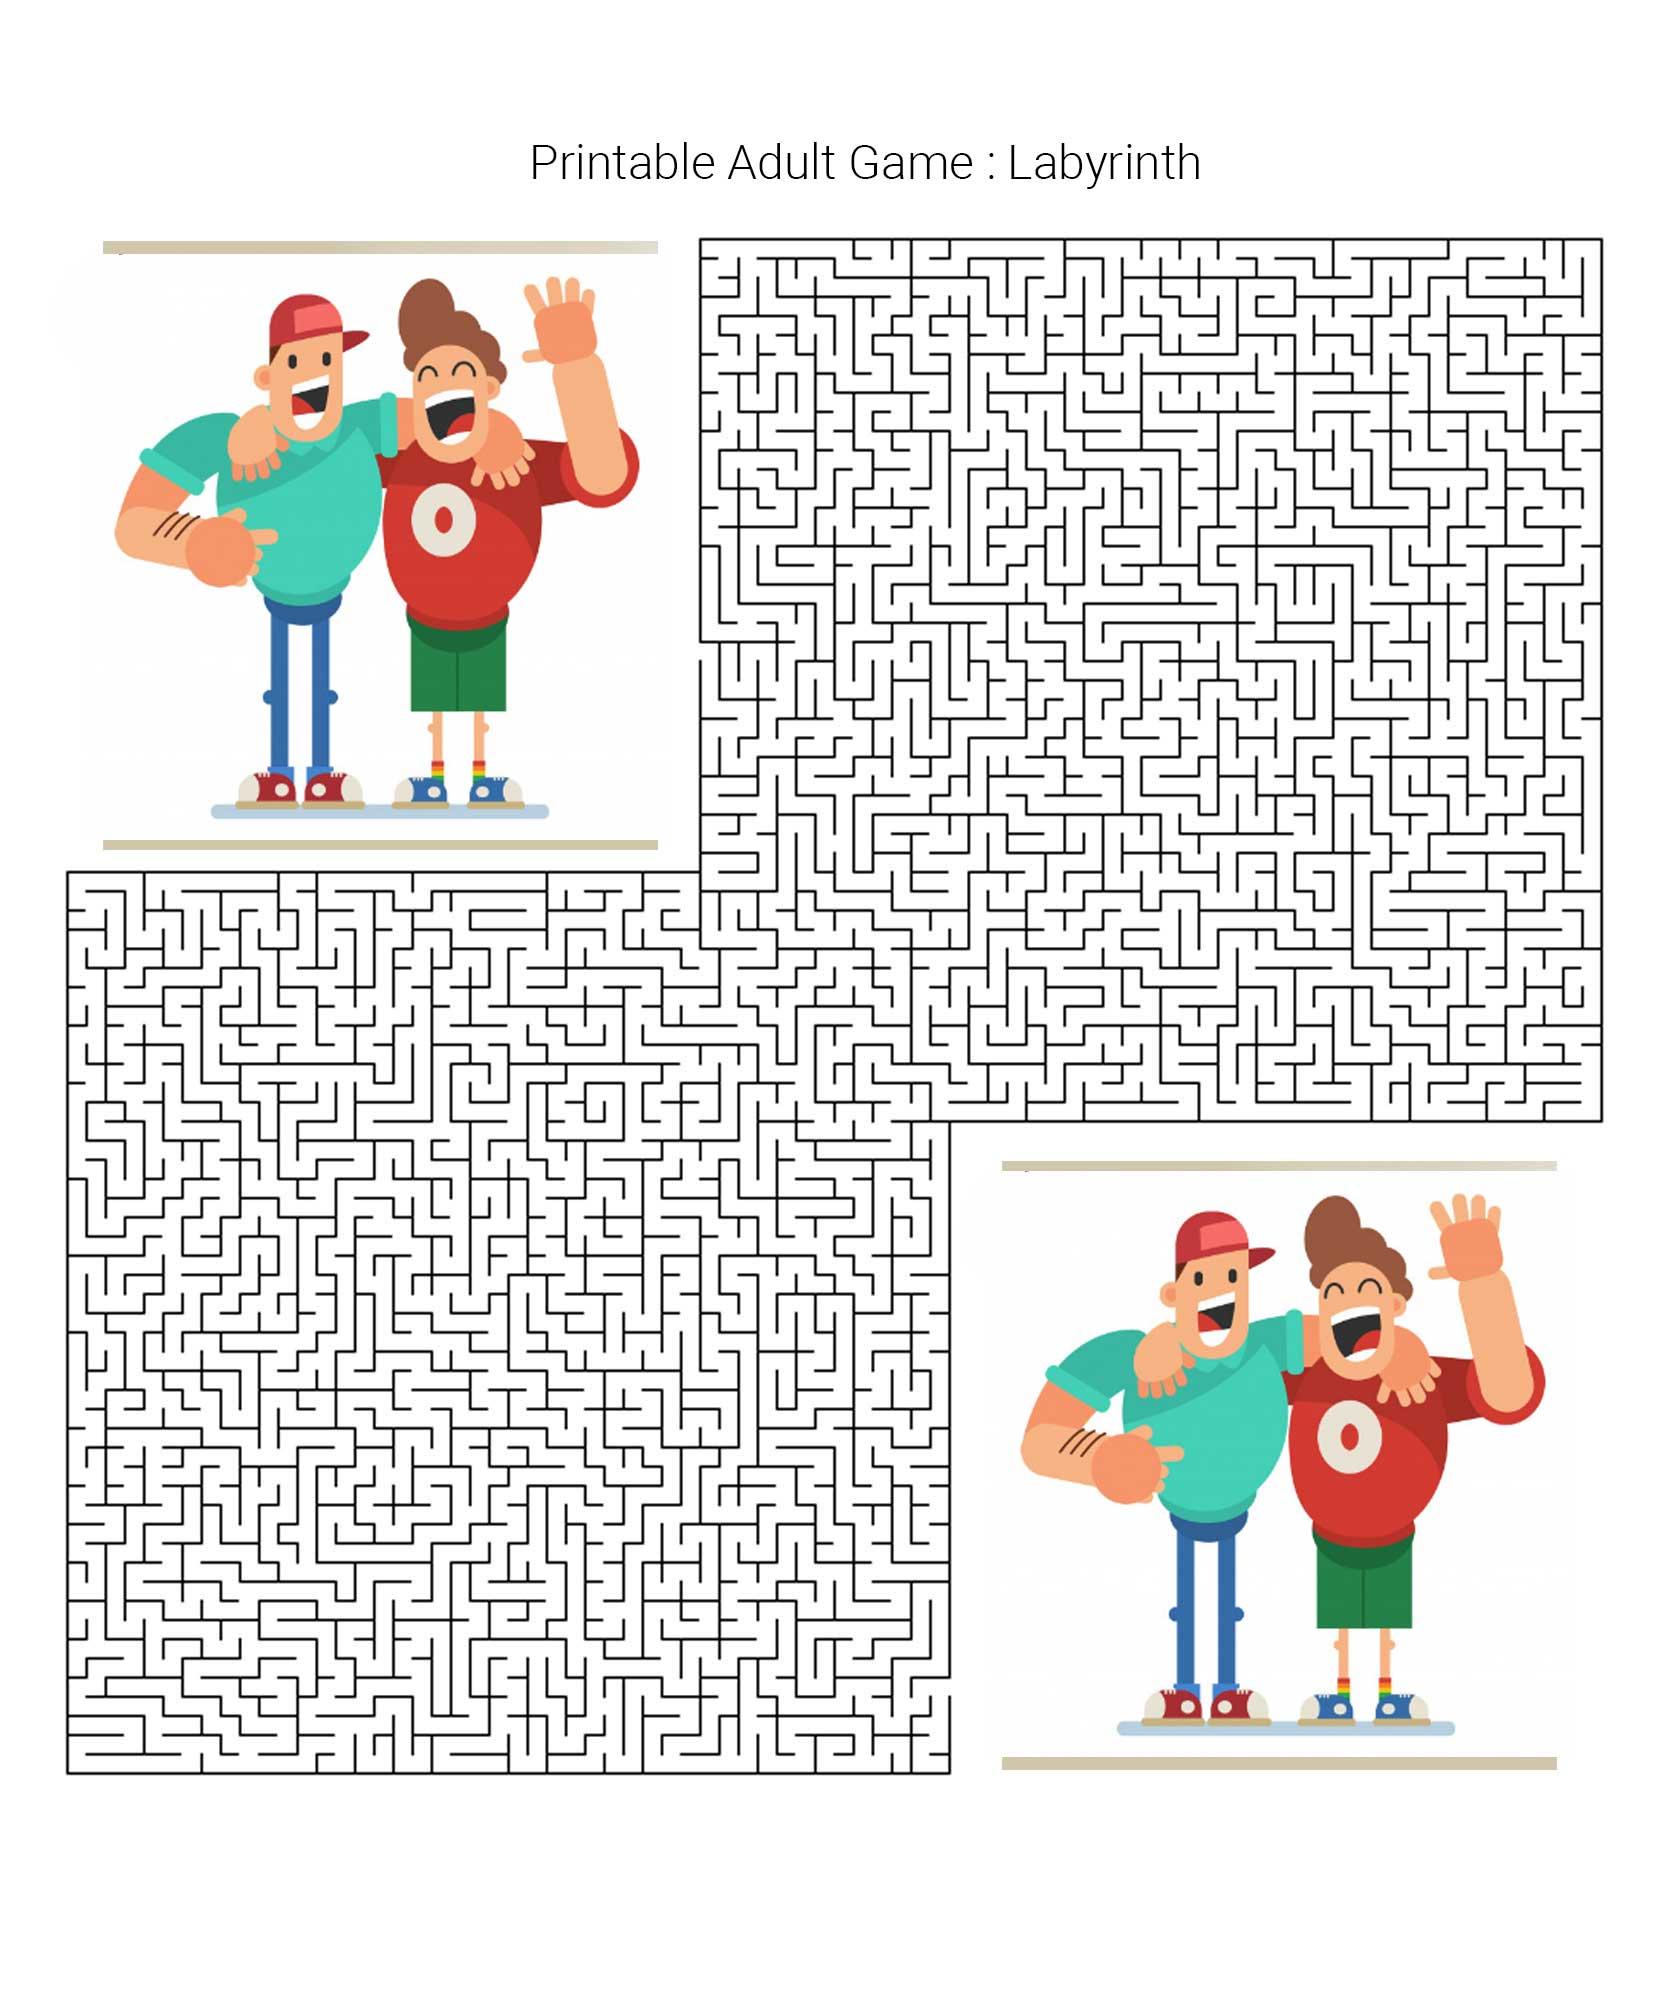 Printable Adult Games